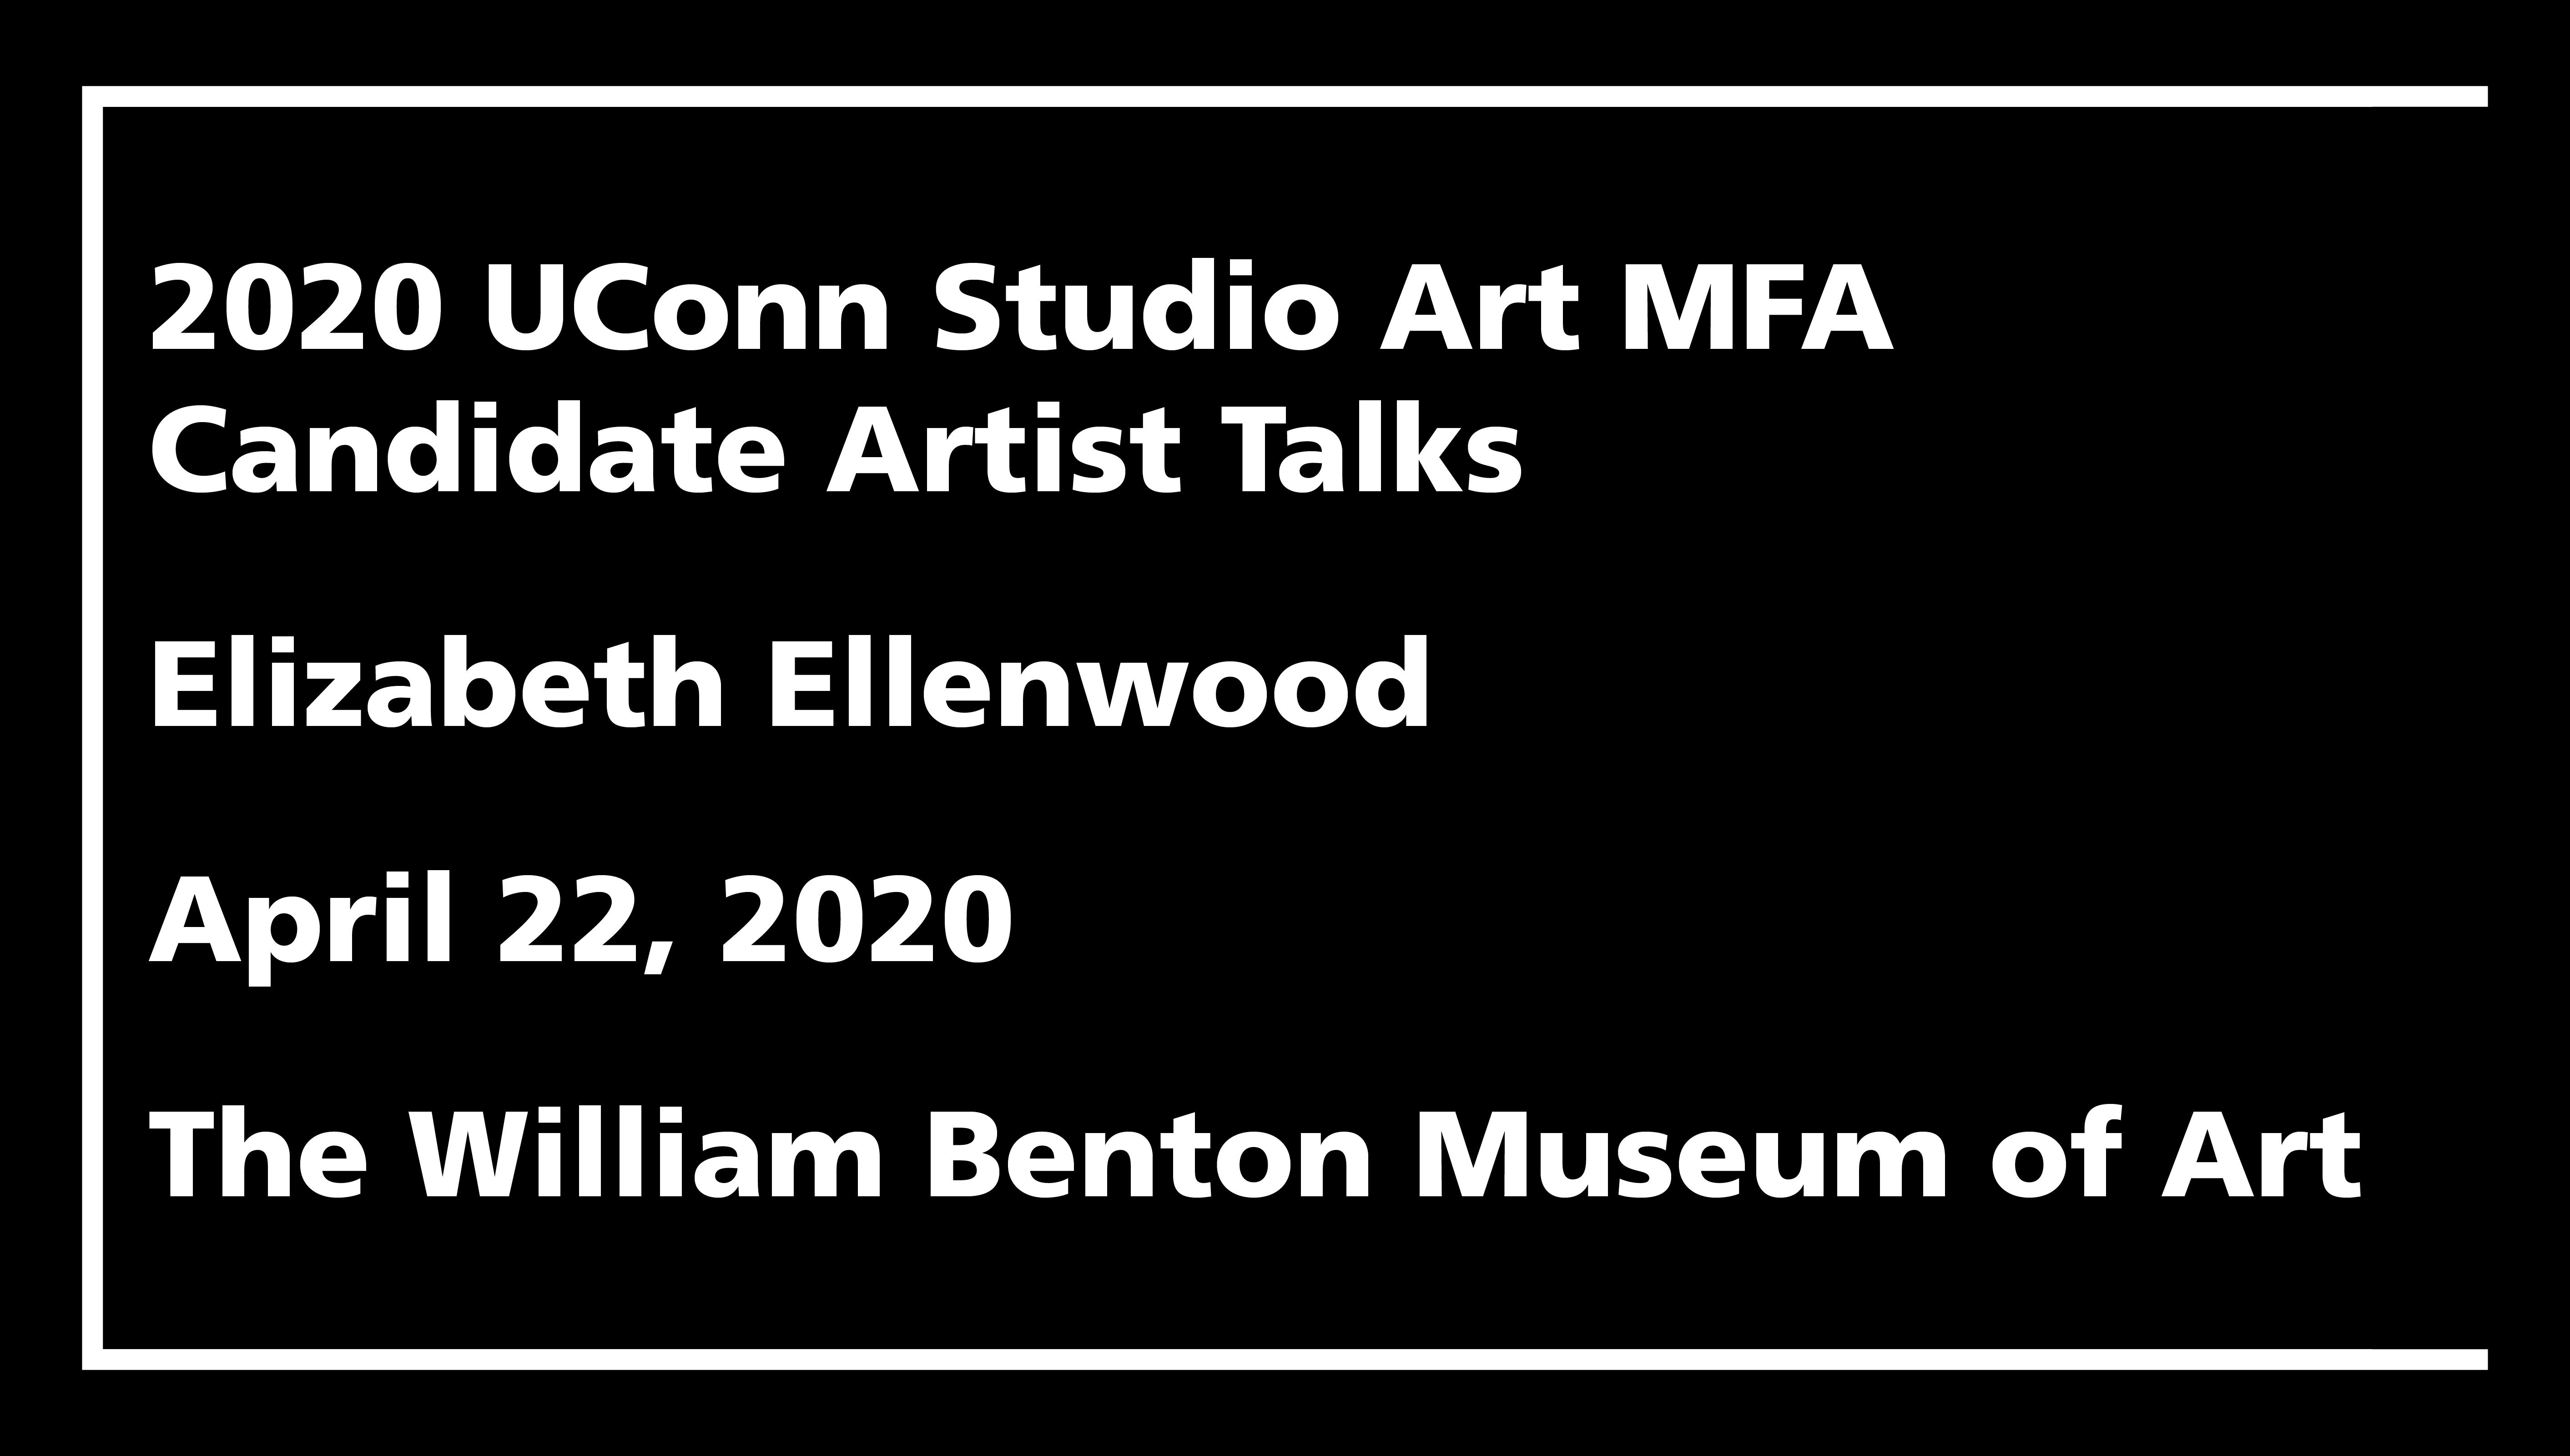 2020 UConn Studio Art MFA Candidate Artist Talks: Elizabeth Ellenwood